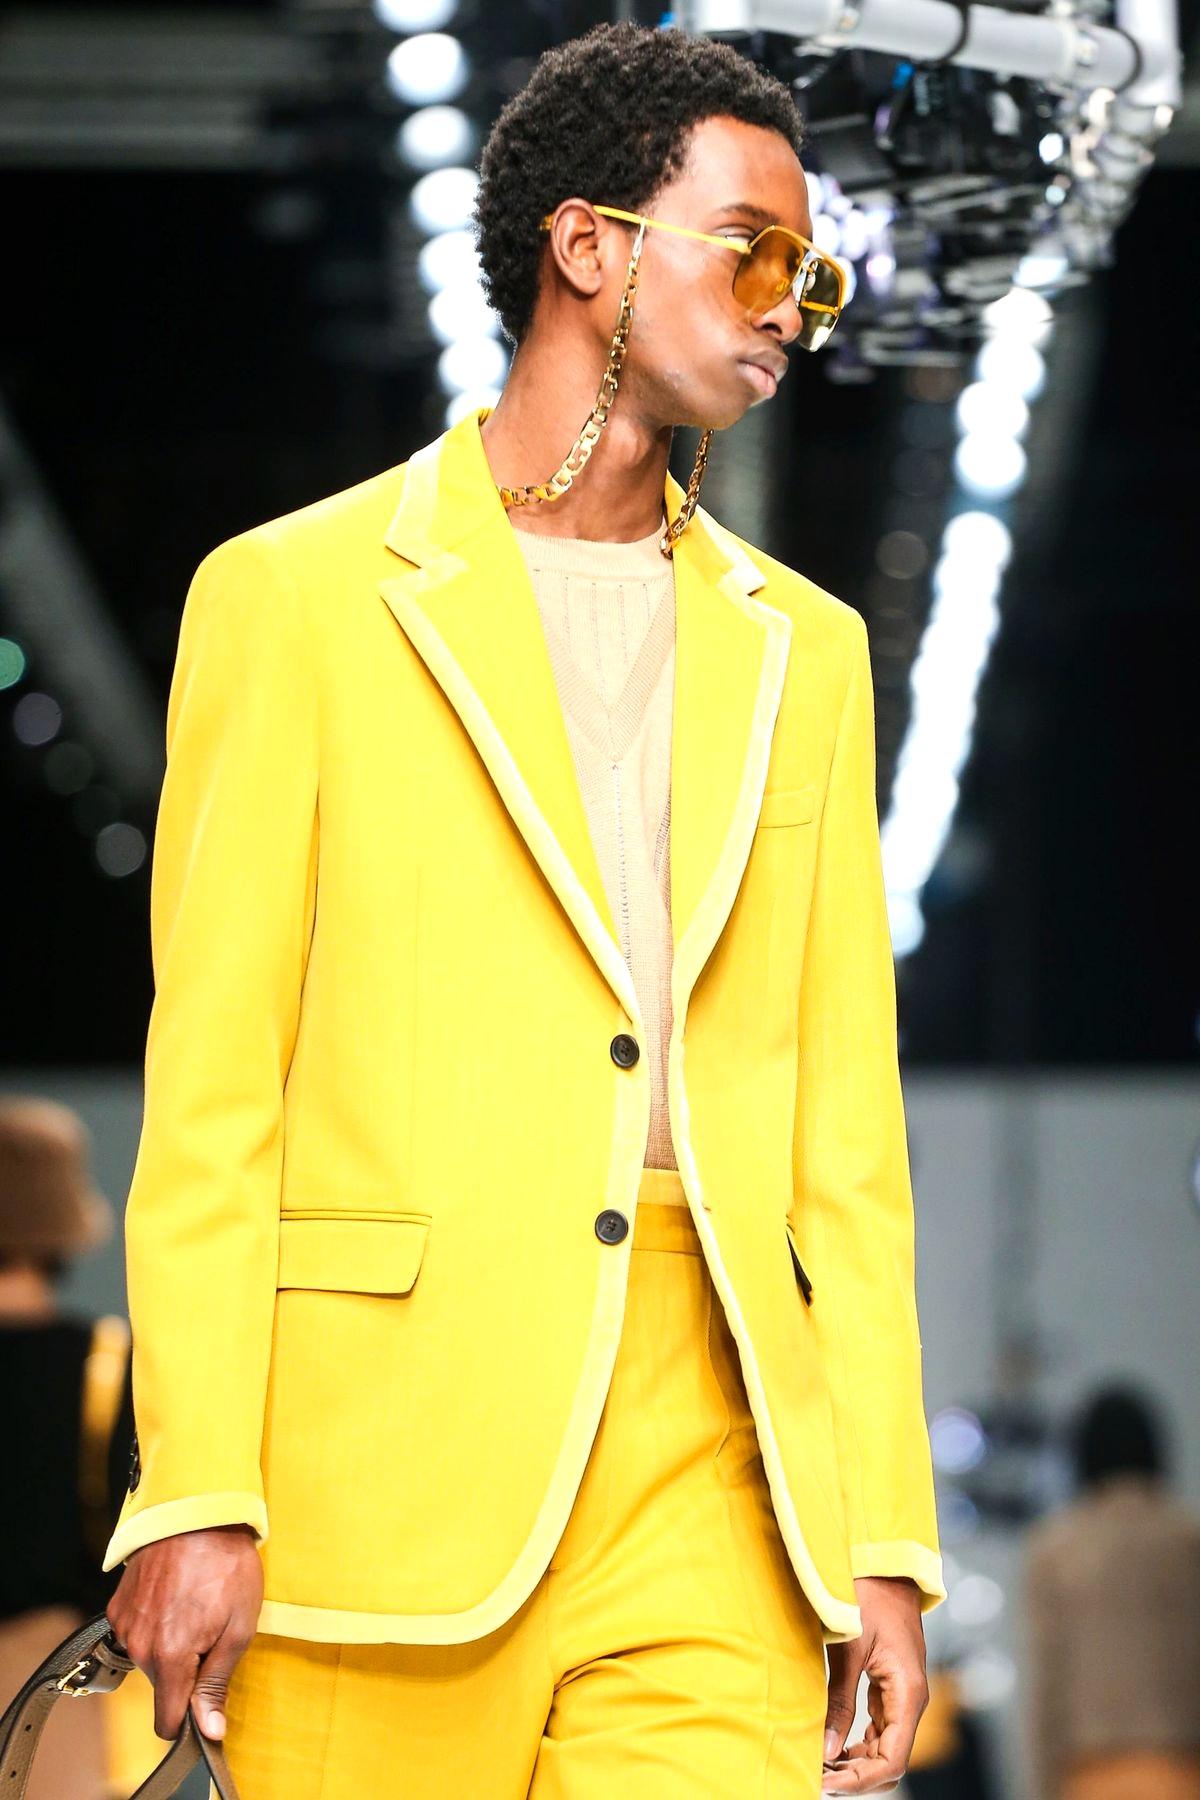 Fendi Fall/Winter 2020 Menswear